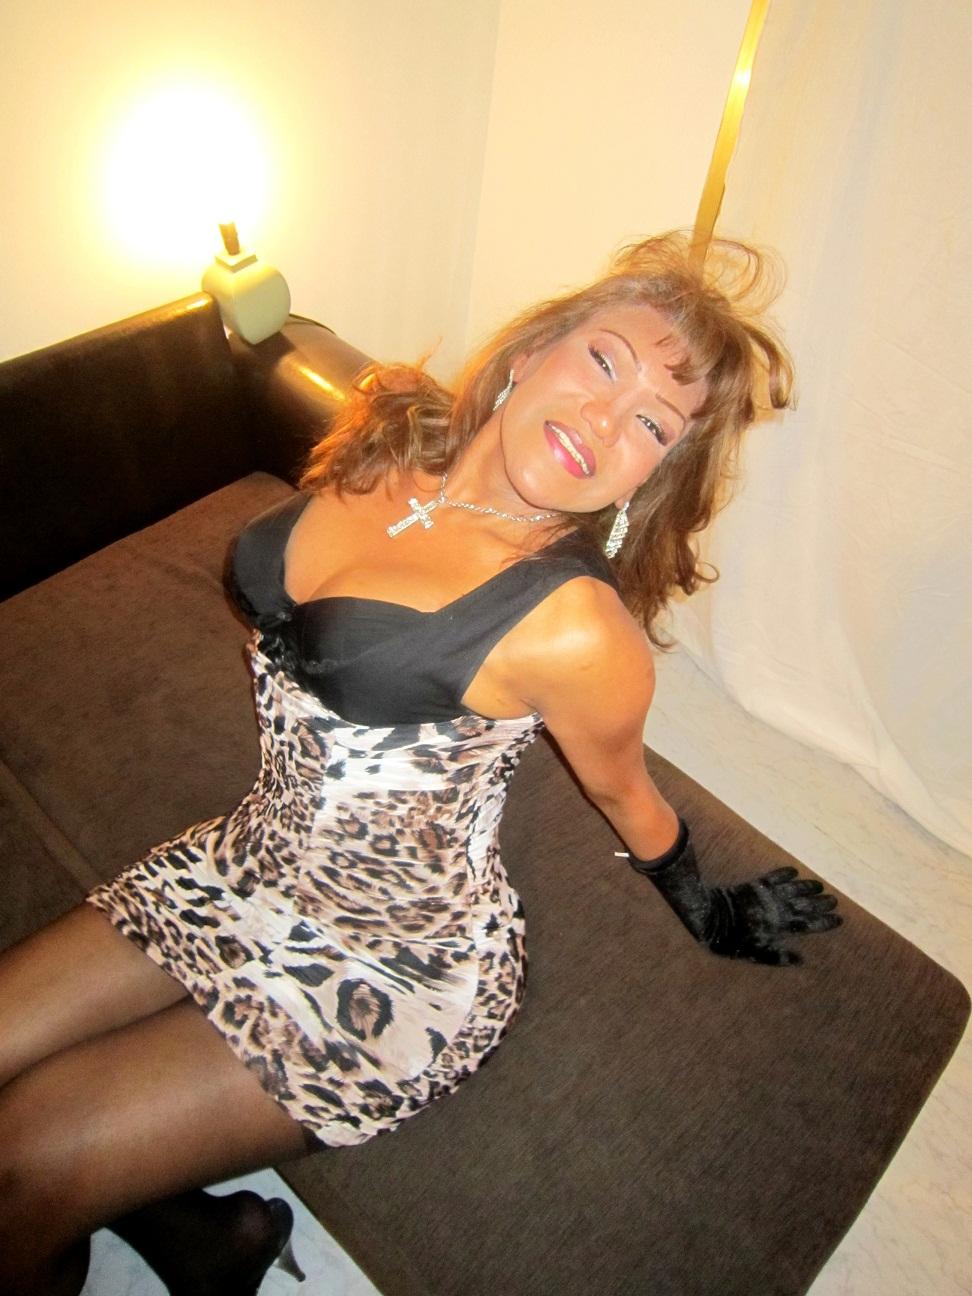 video erotique amateur escort trans nice